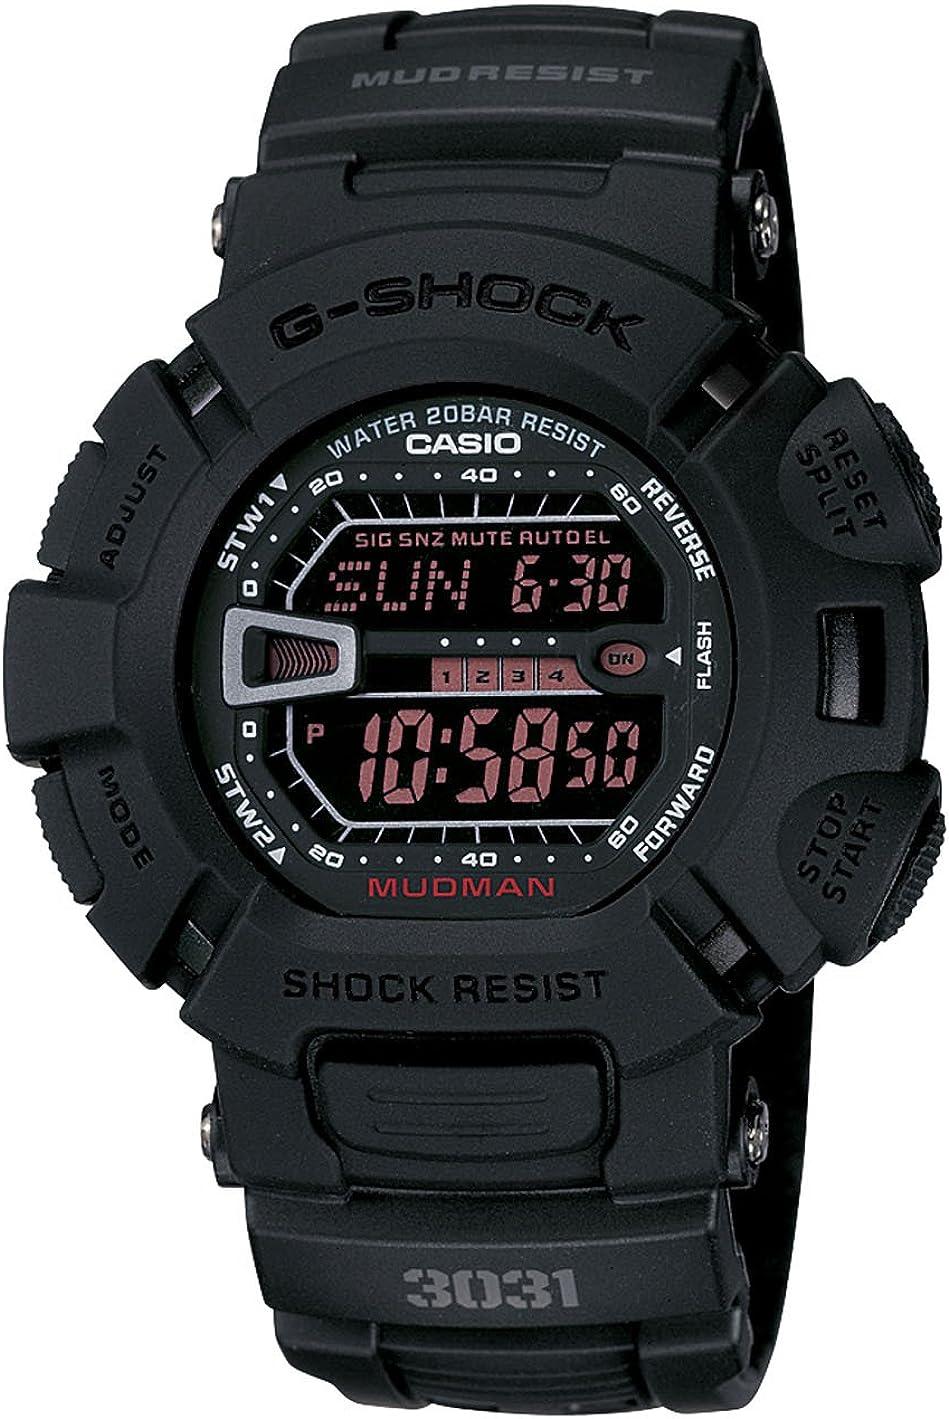 Casio G-Shock G9000MS-1CR Men's Military Black Resin Sport Watch